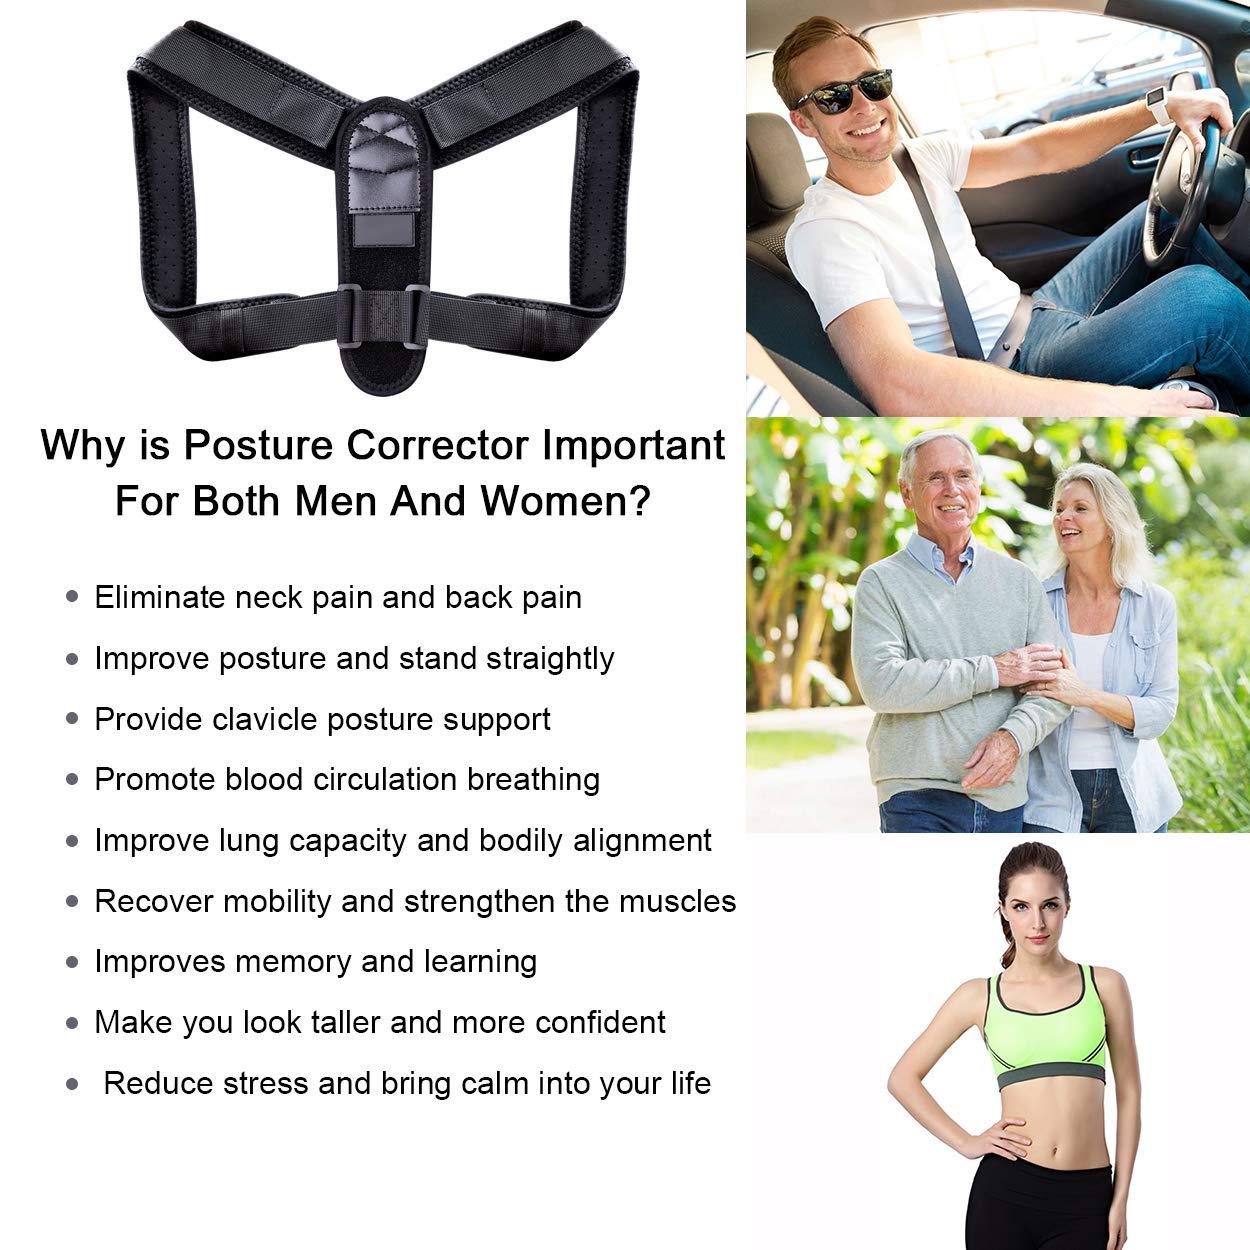 Posture Corrector for Women Men, Upper Back Brace for Clavicle Support, Adjustable Back Straightener and Providing Pain Relief from Neck, Back & Shoulder